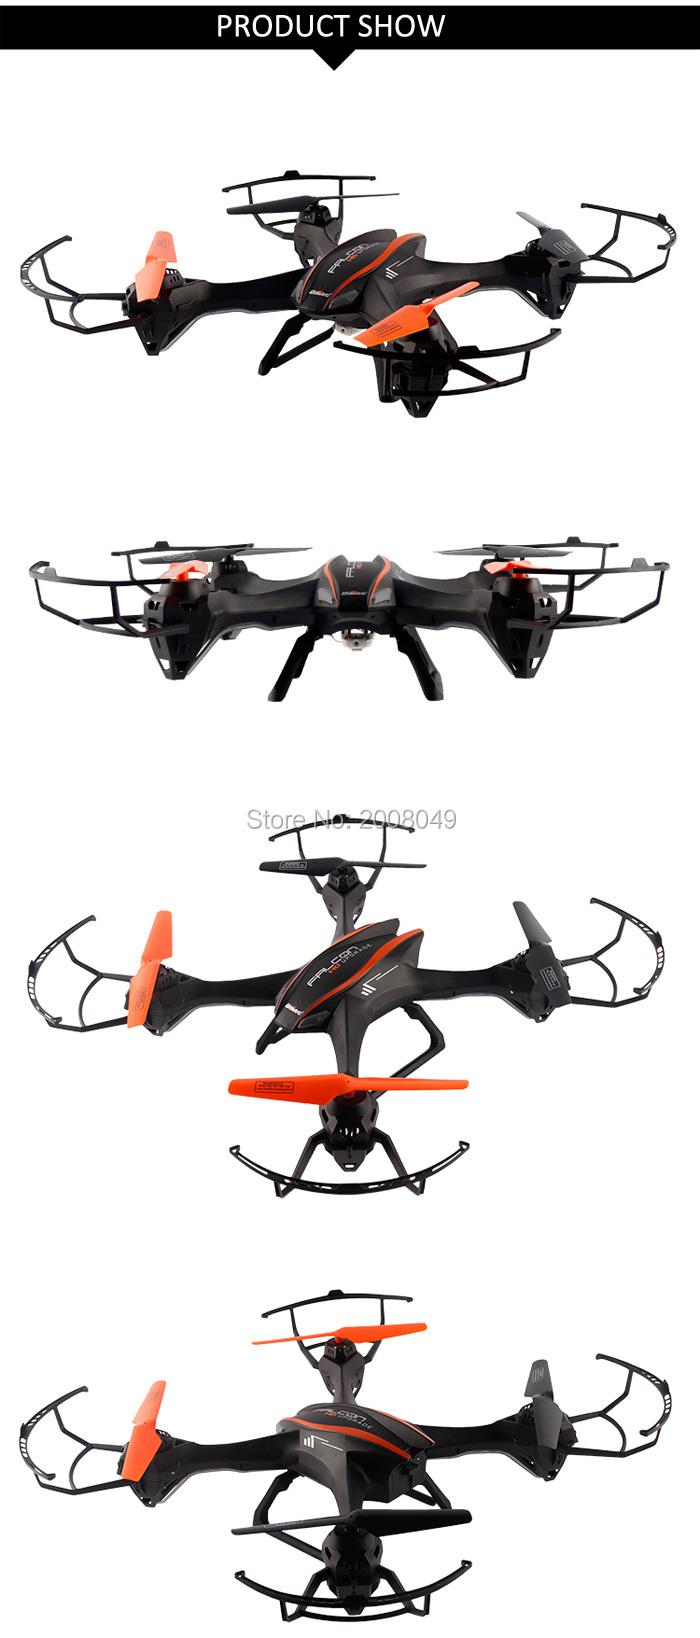 UDI U818S 2.4G 4CH RC Quadcopter 6 Axis Gyro 3D Flip RTF